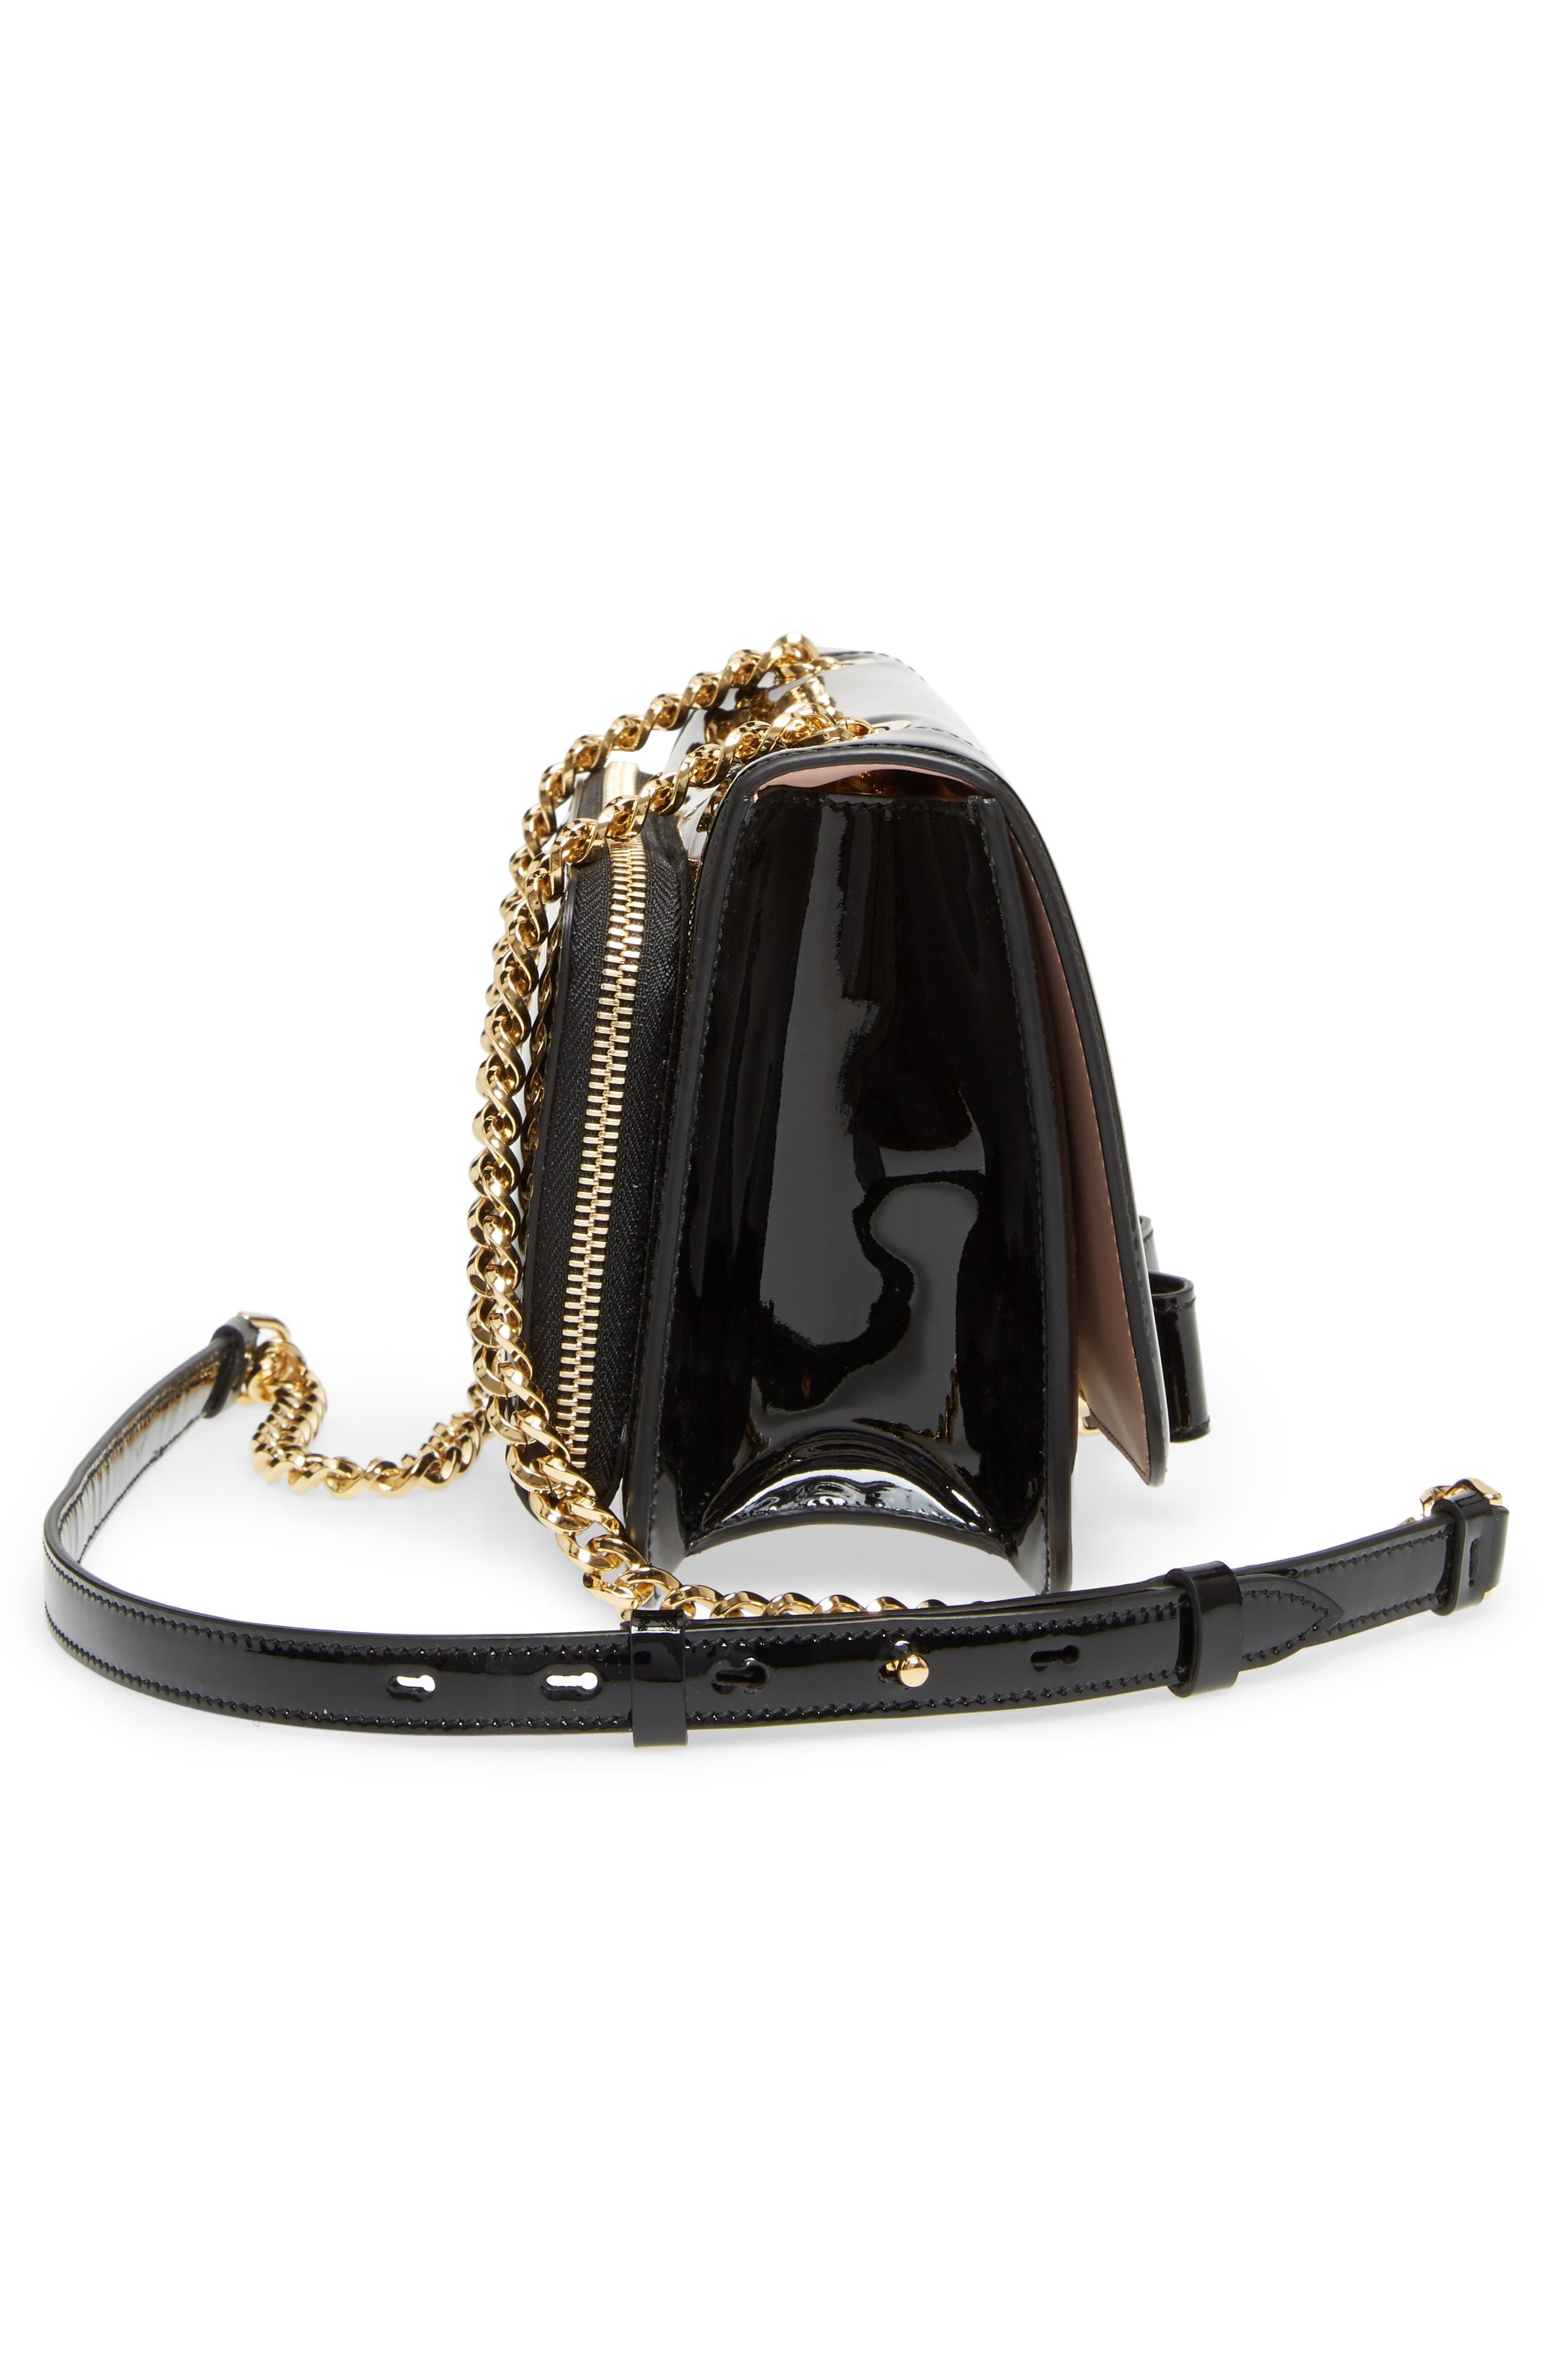 Vara Patent Leather Shoulder Bag,                             Alternate thumbnail 5, color,                             Nero/ Bonbon